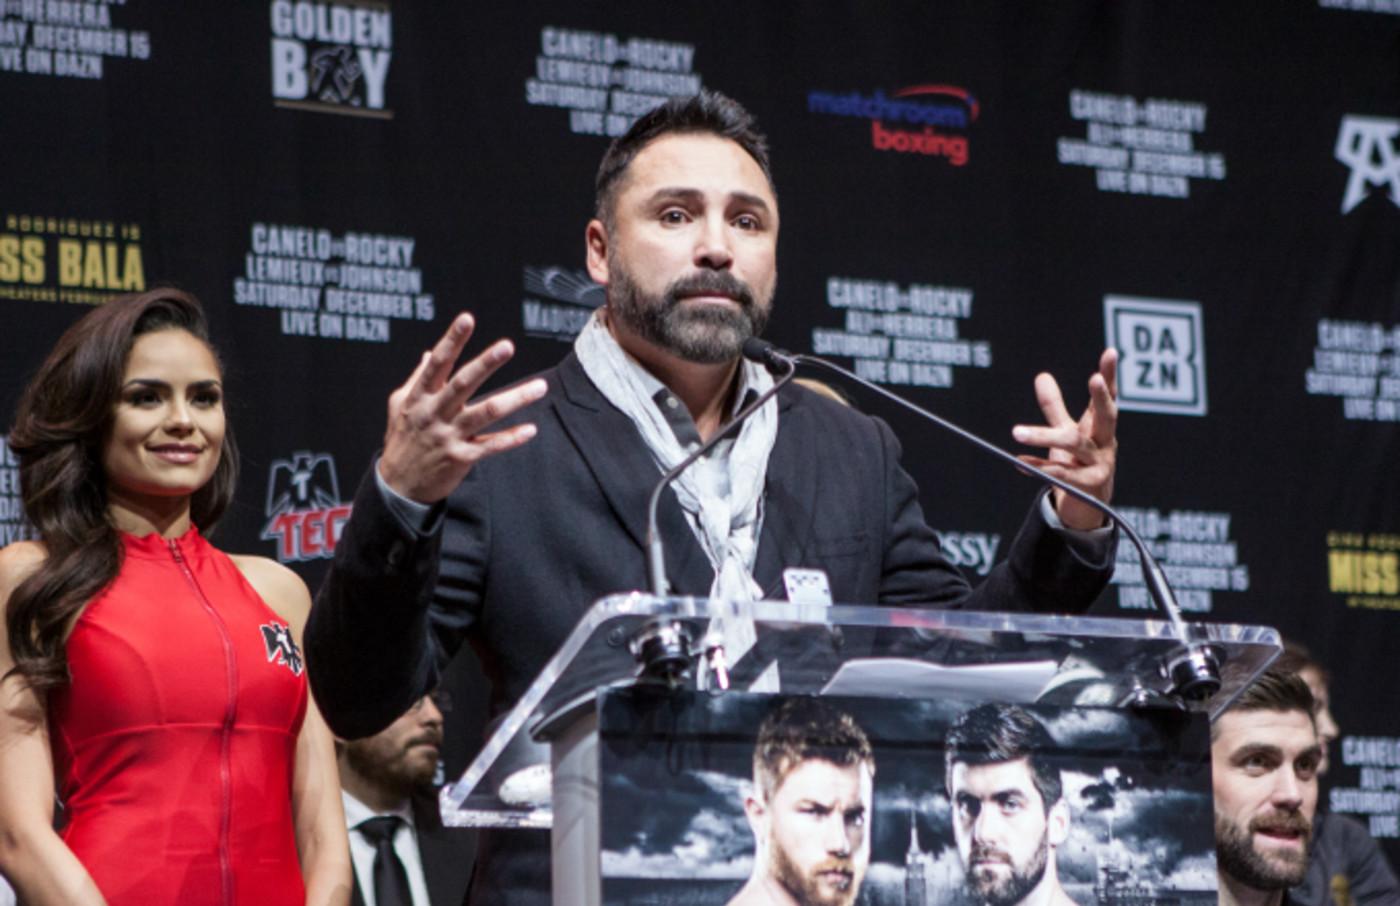 Oscar De La Hoya speaks during the Canelo vs. Rocky final press conference